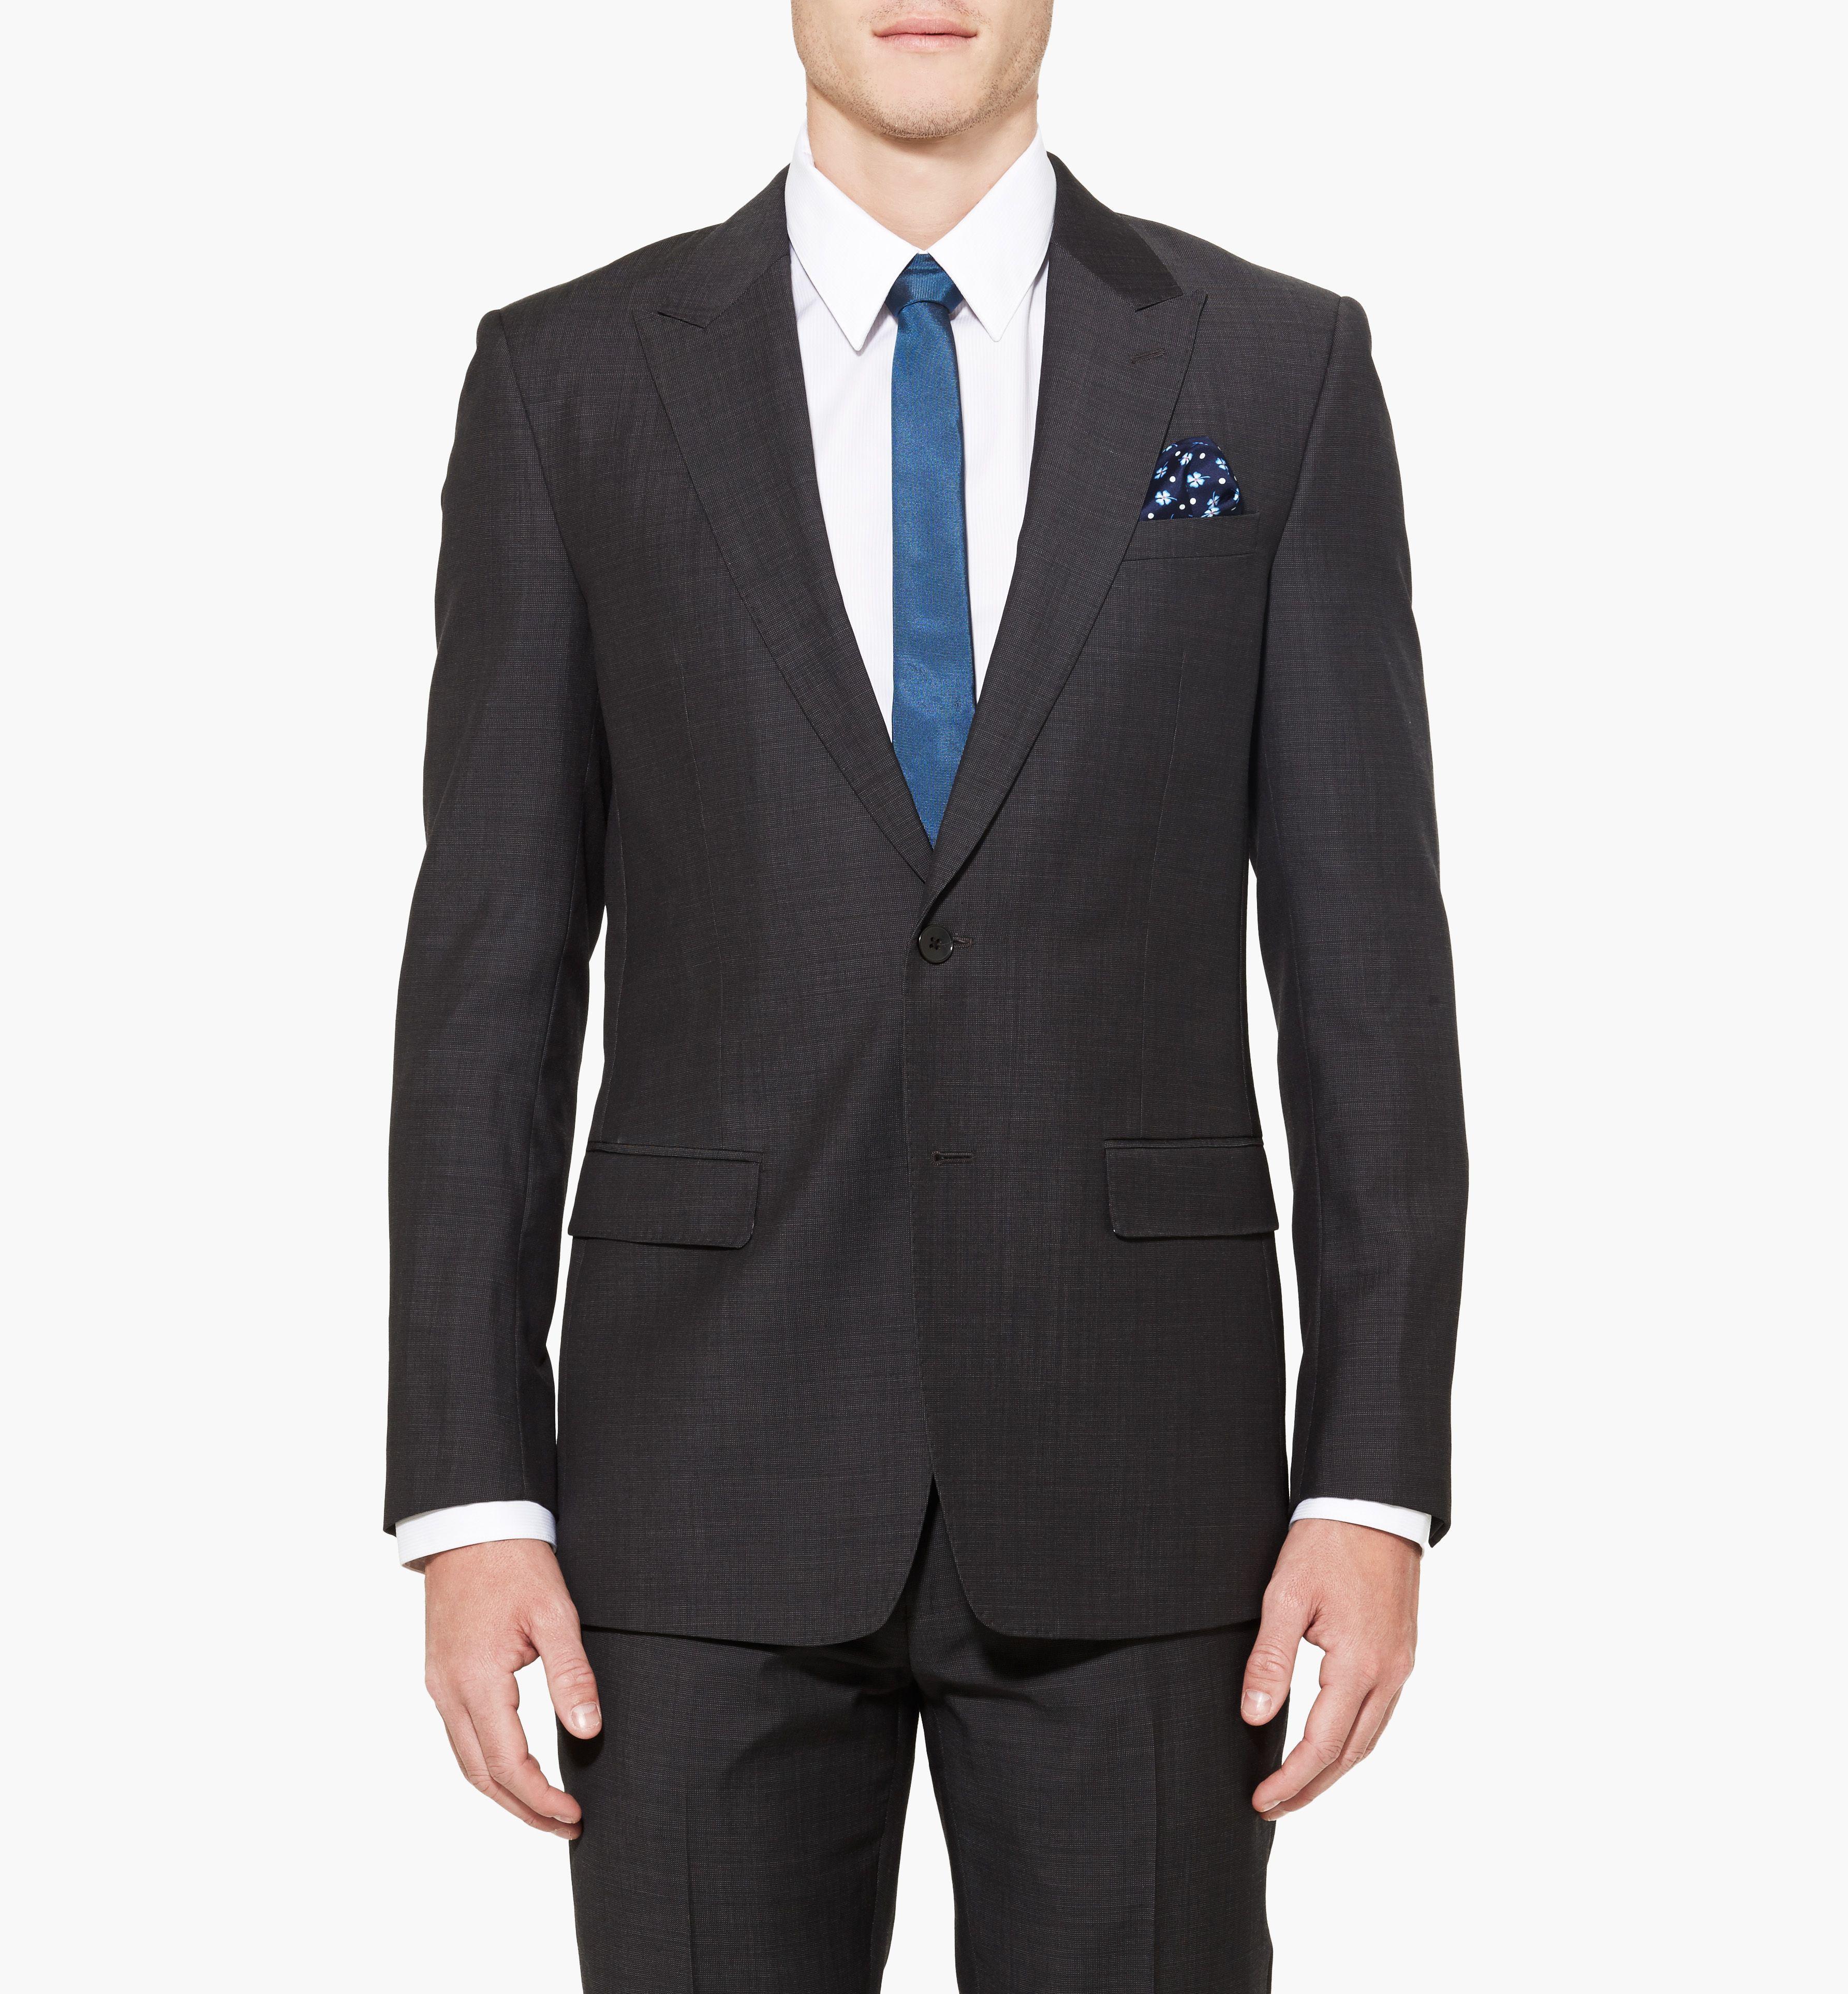 Black Micro Dot Suit S/C at Westfield Bondi Junction